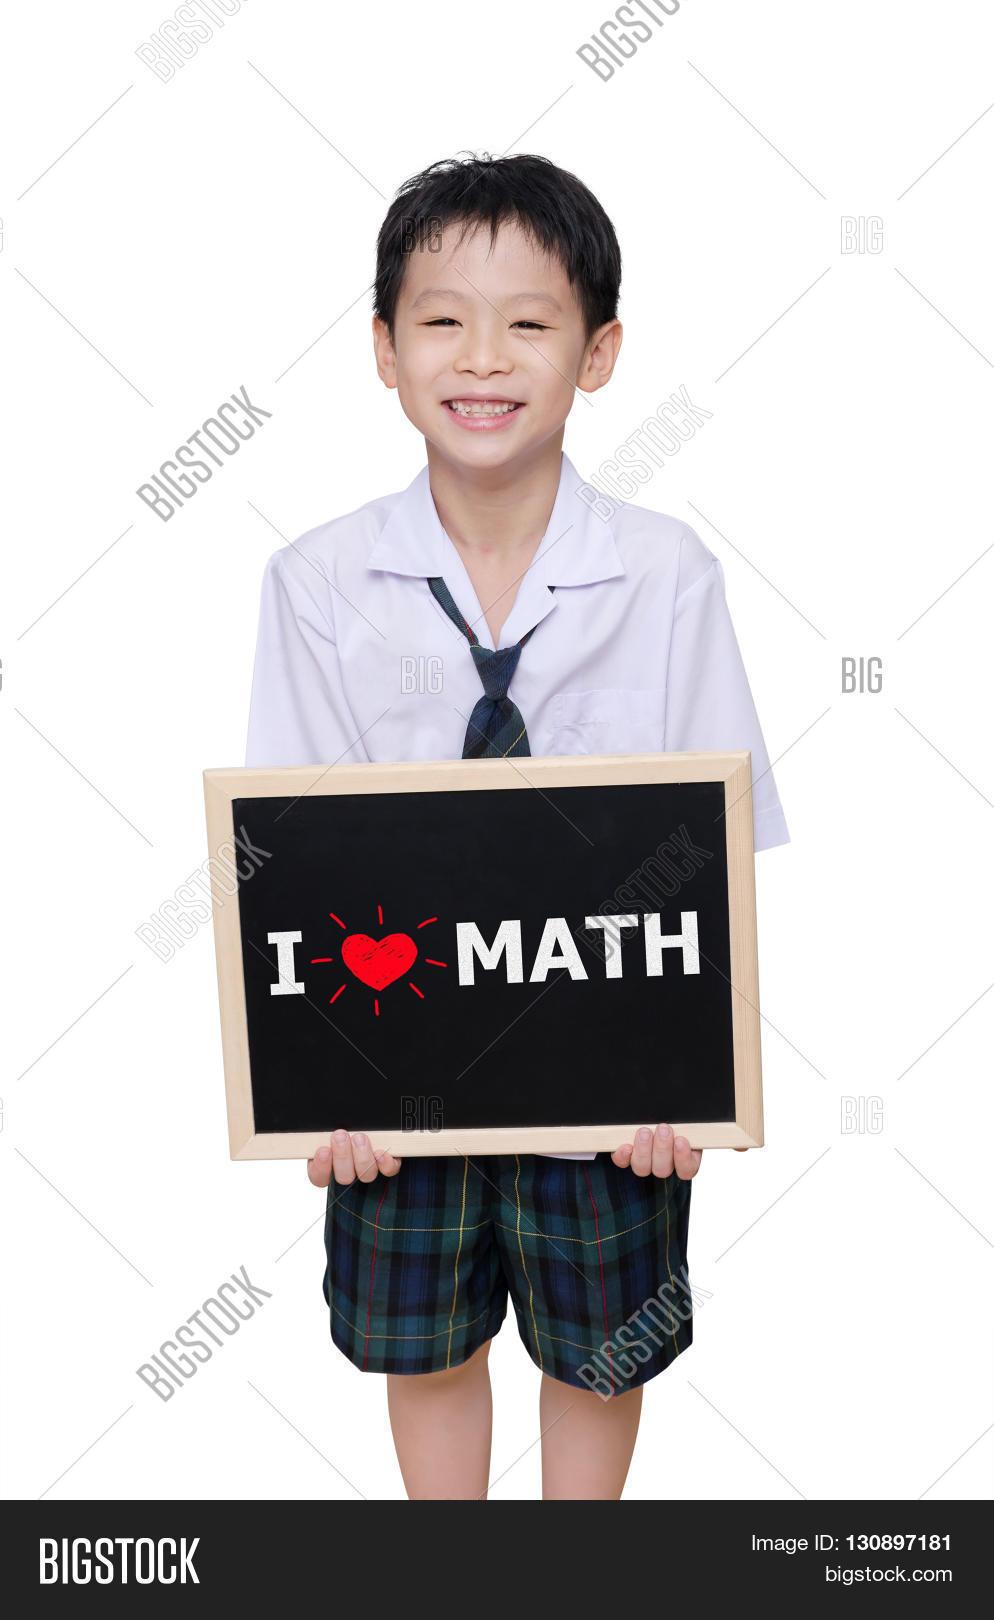 I love asian students